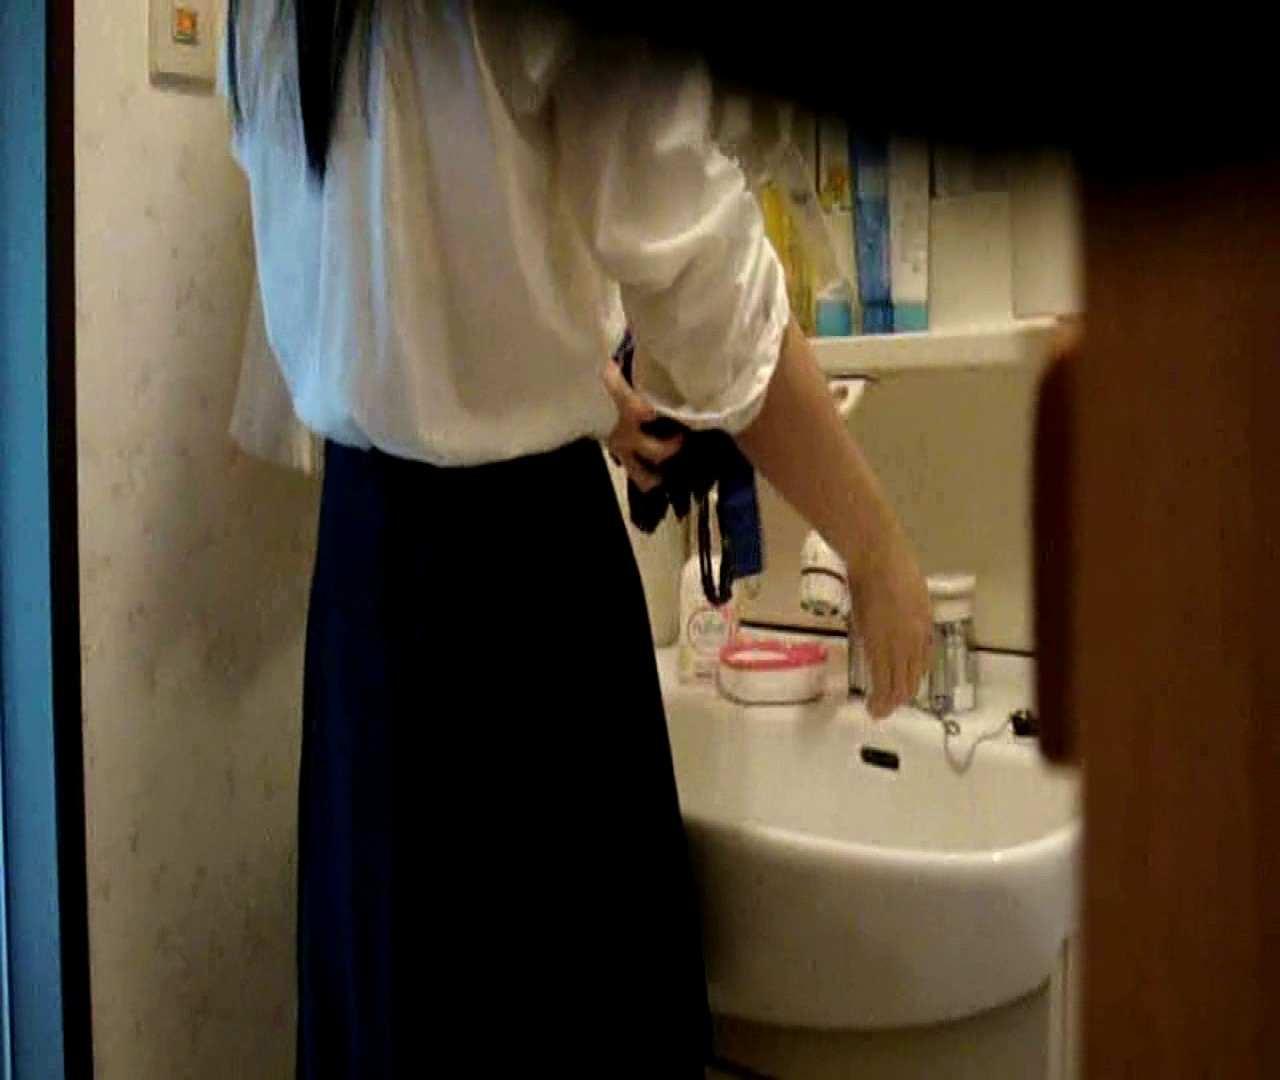 vol.5 まどかが帰宅後の洗顔後にブラを洗ってます。 ギャル達  112枚 28